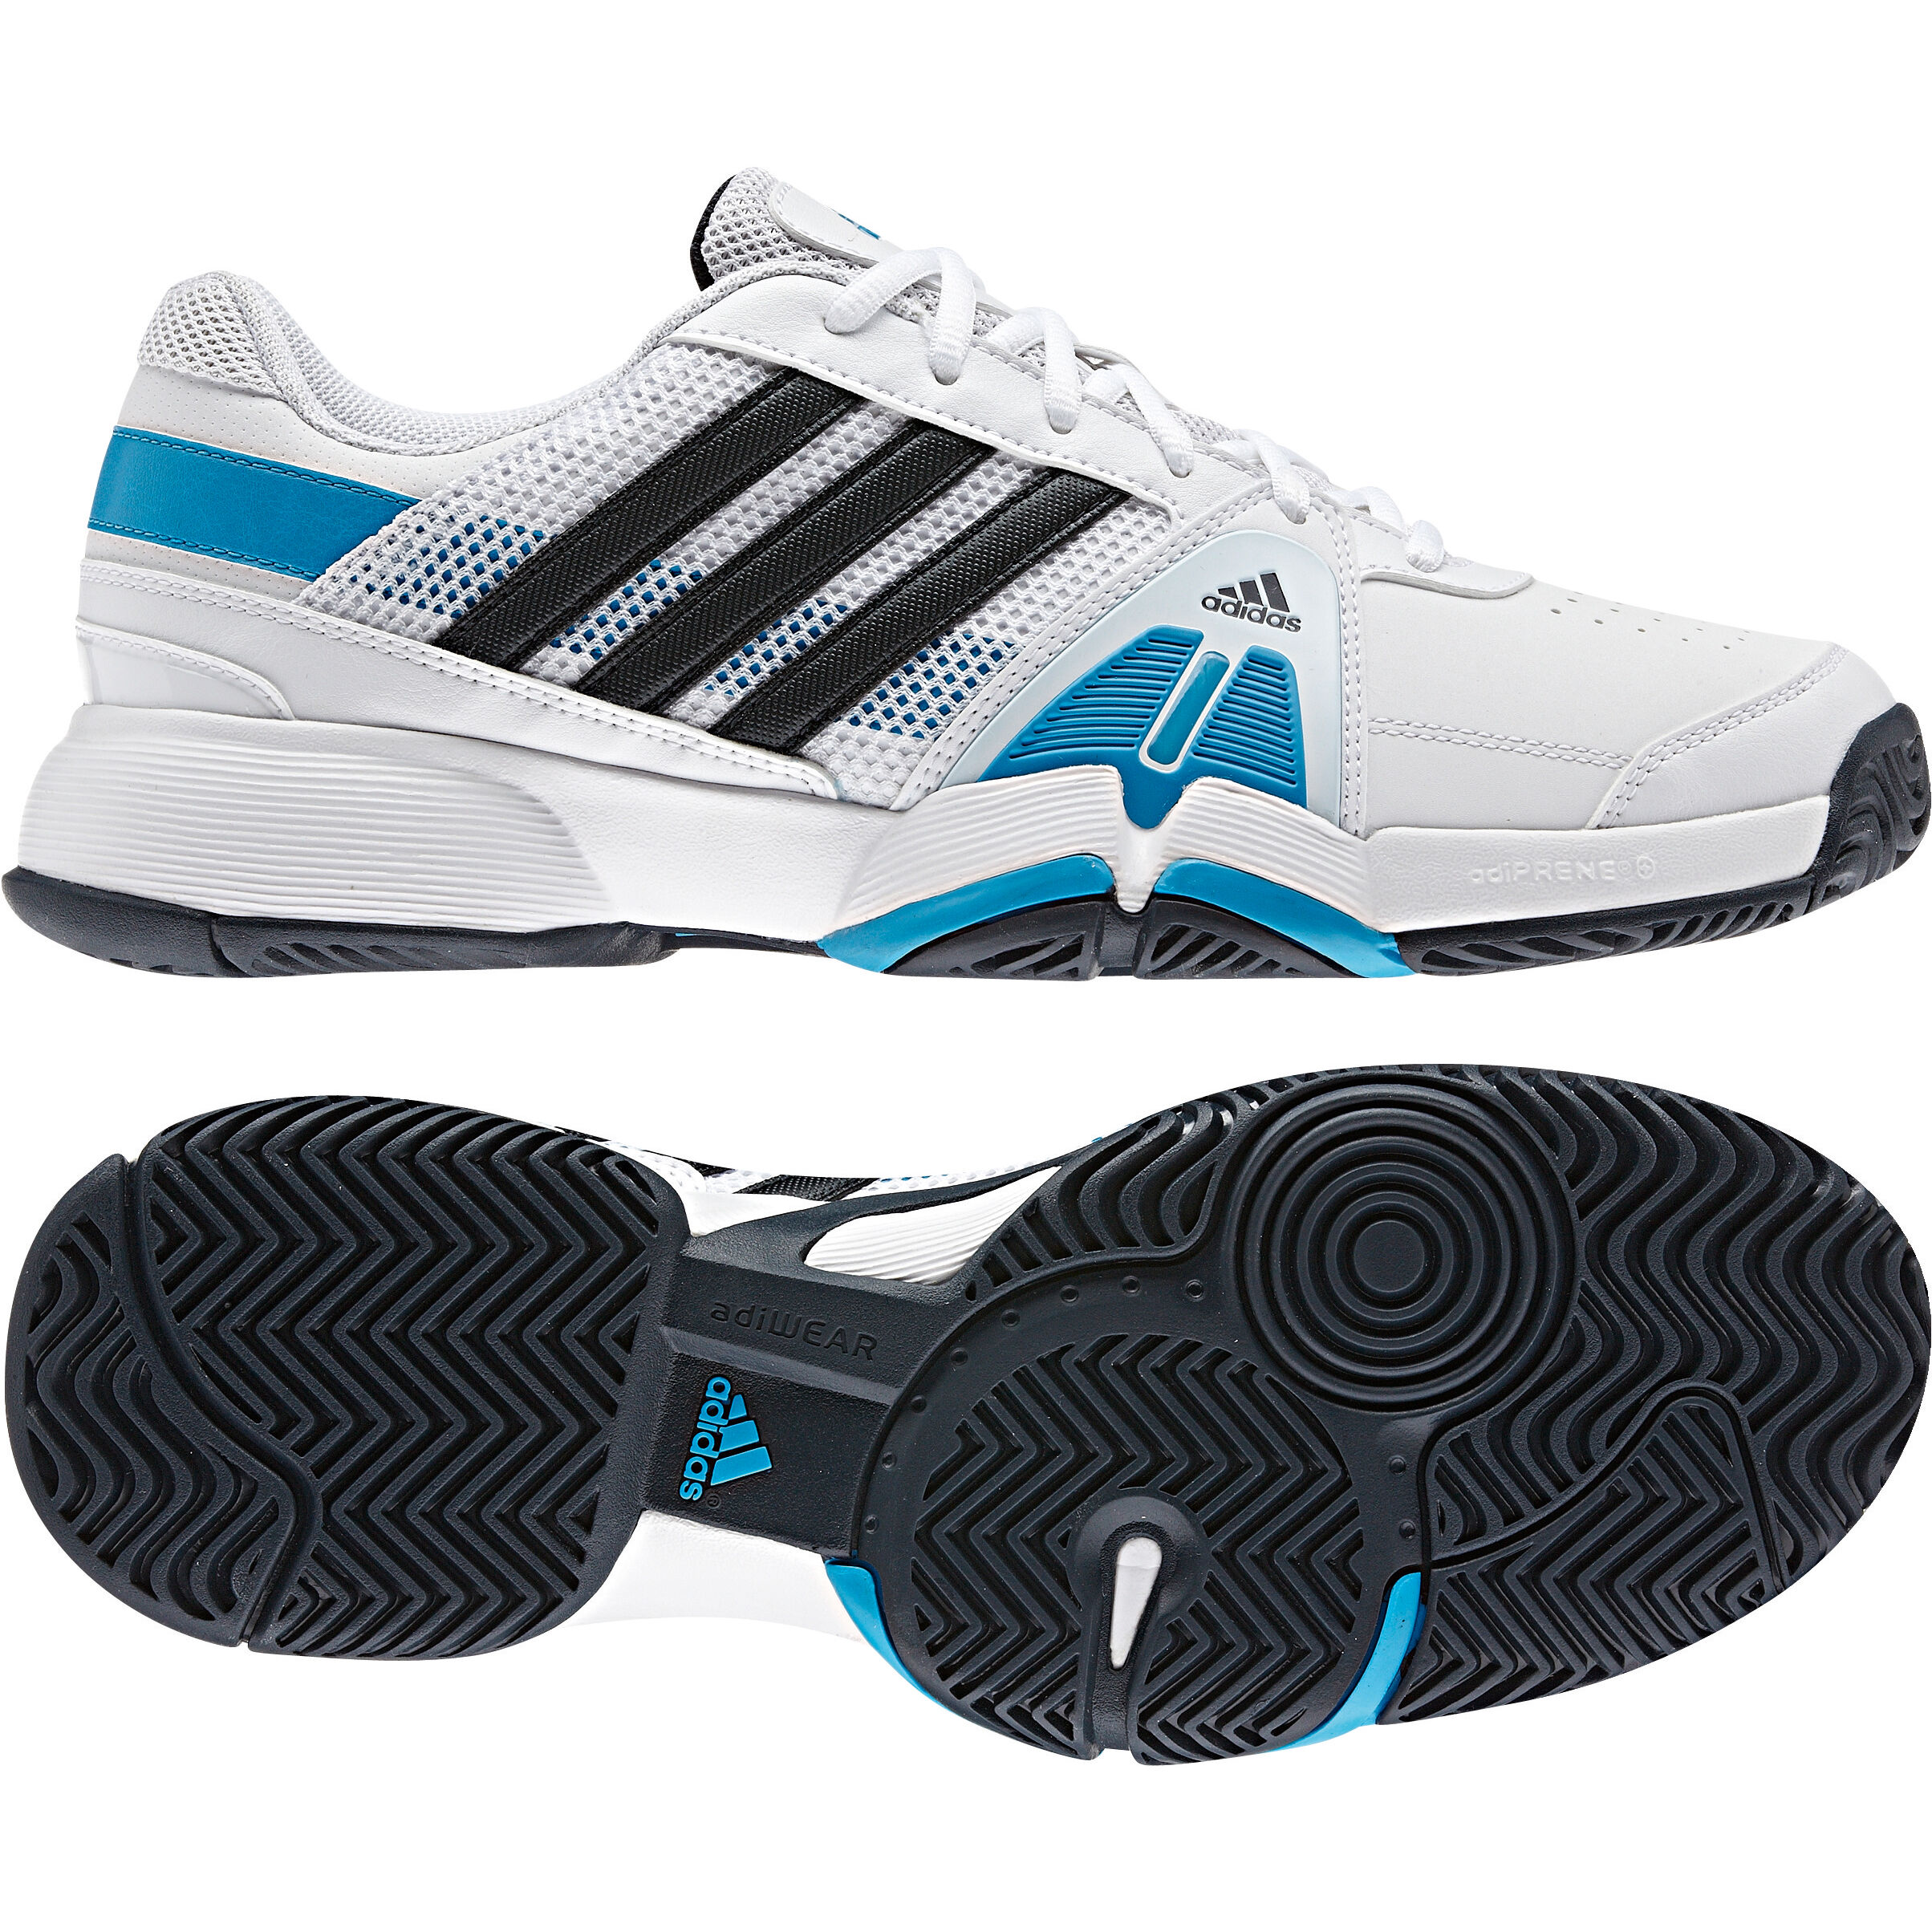 adidas Barricade Team 3 Chaussures Toutes Surfaces Hommes